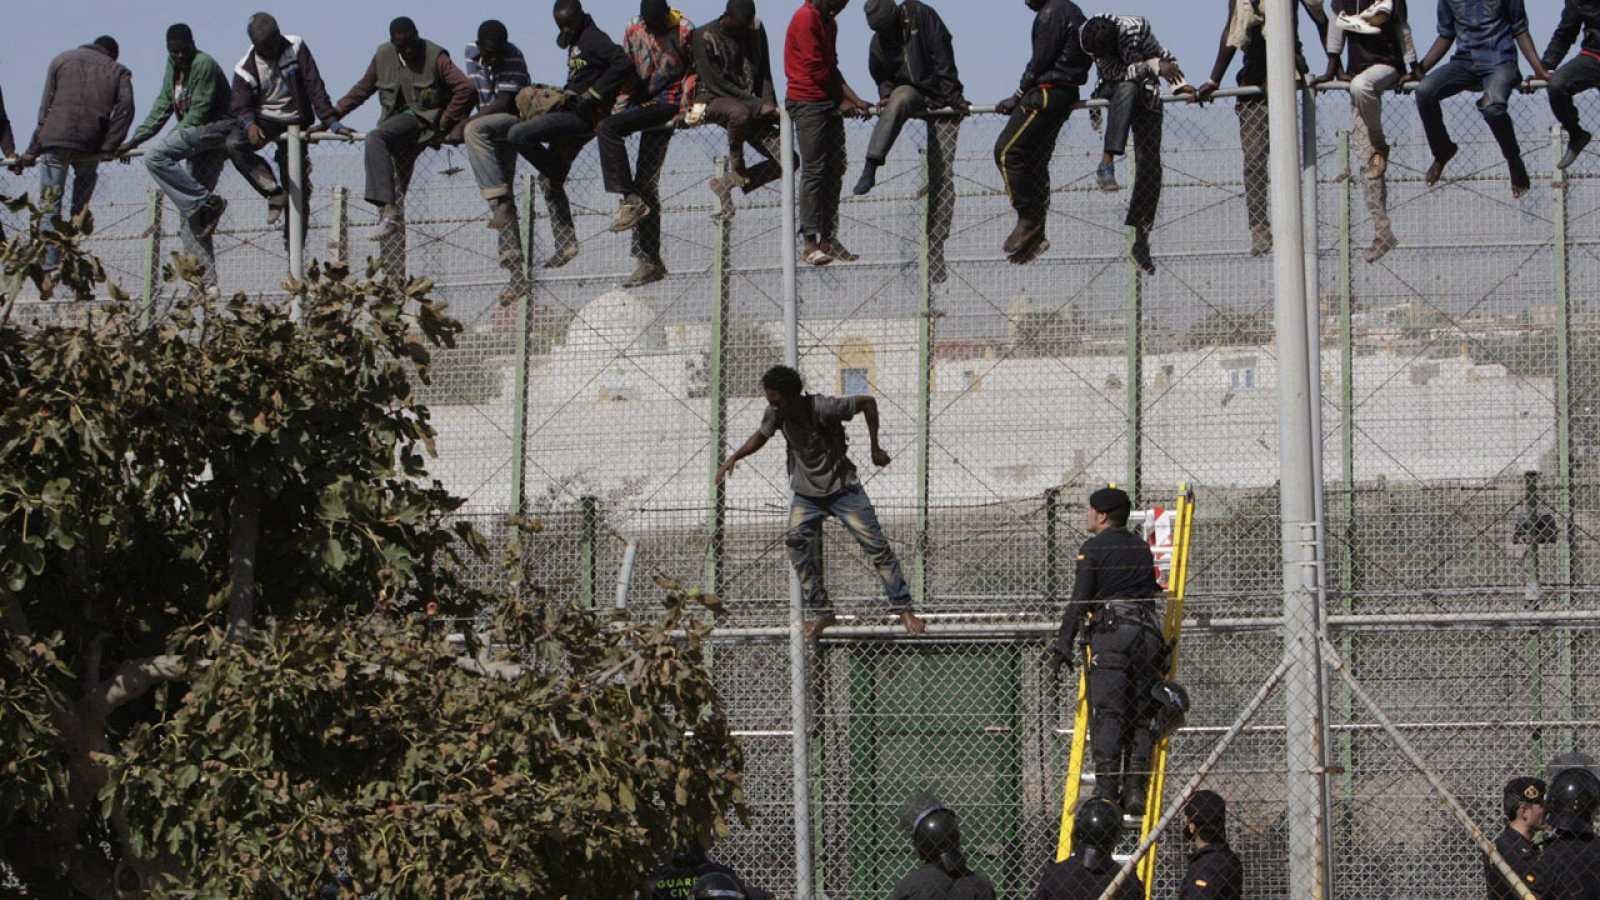 Un grupo de migrantes subsaharianos encaramados a la valla de Melilla en 2015